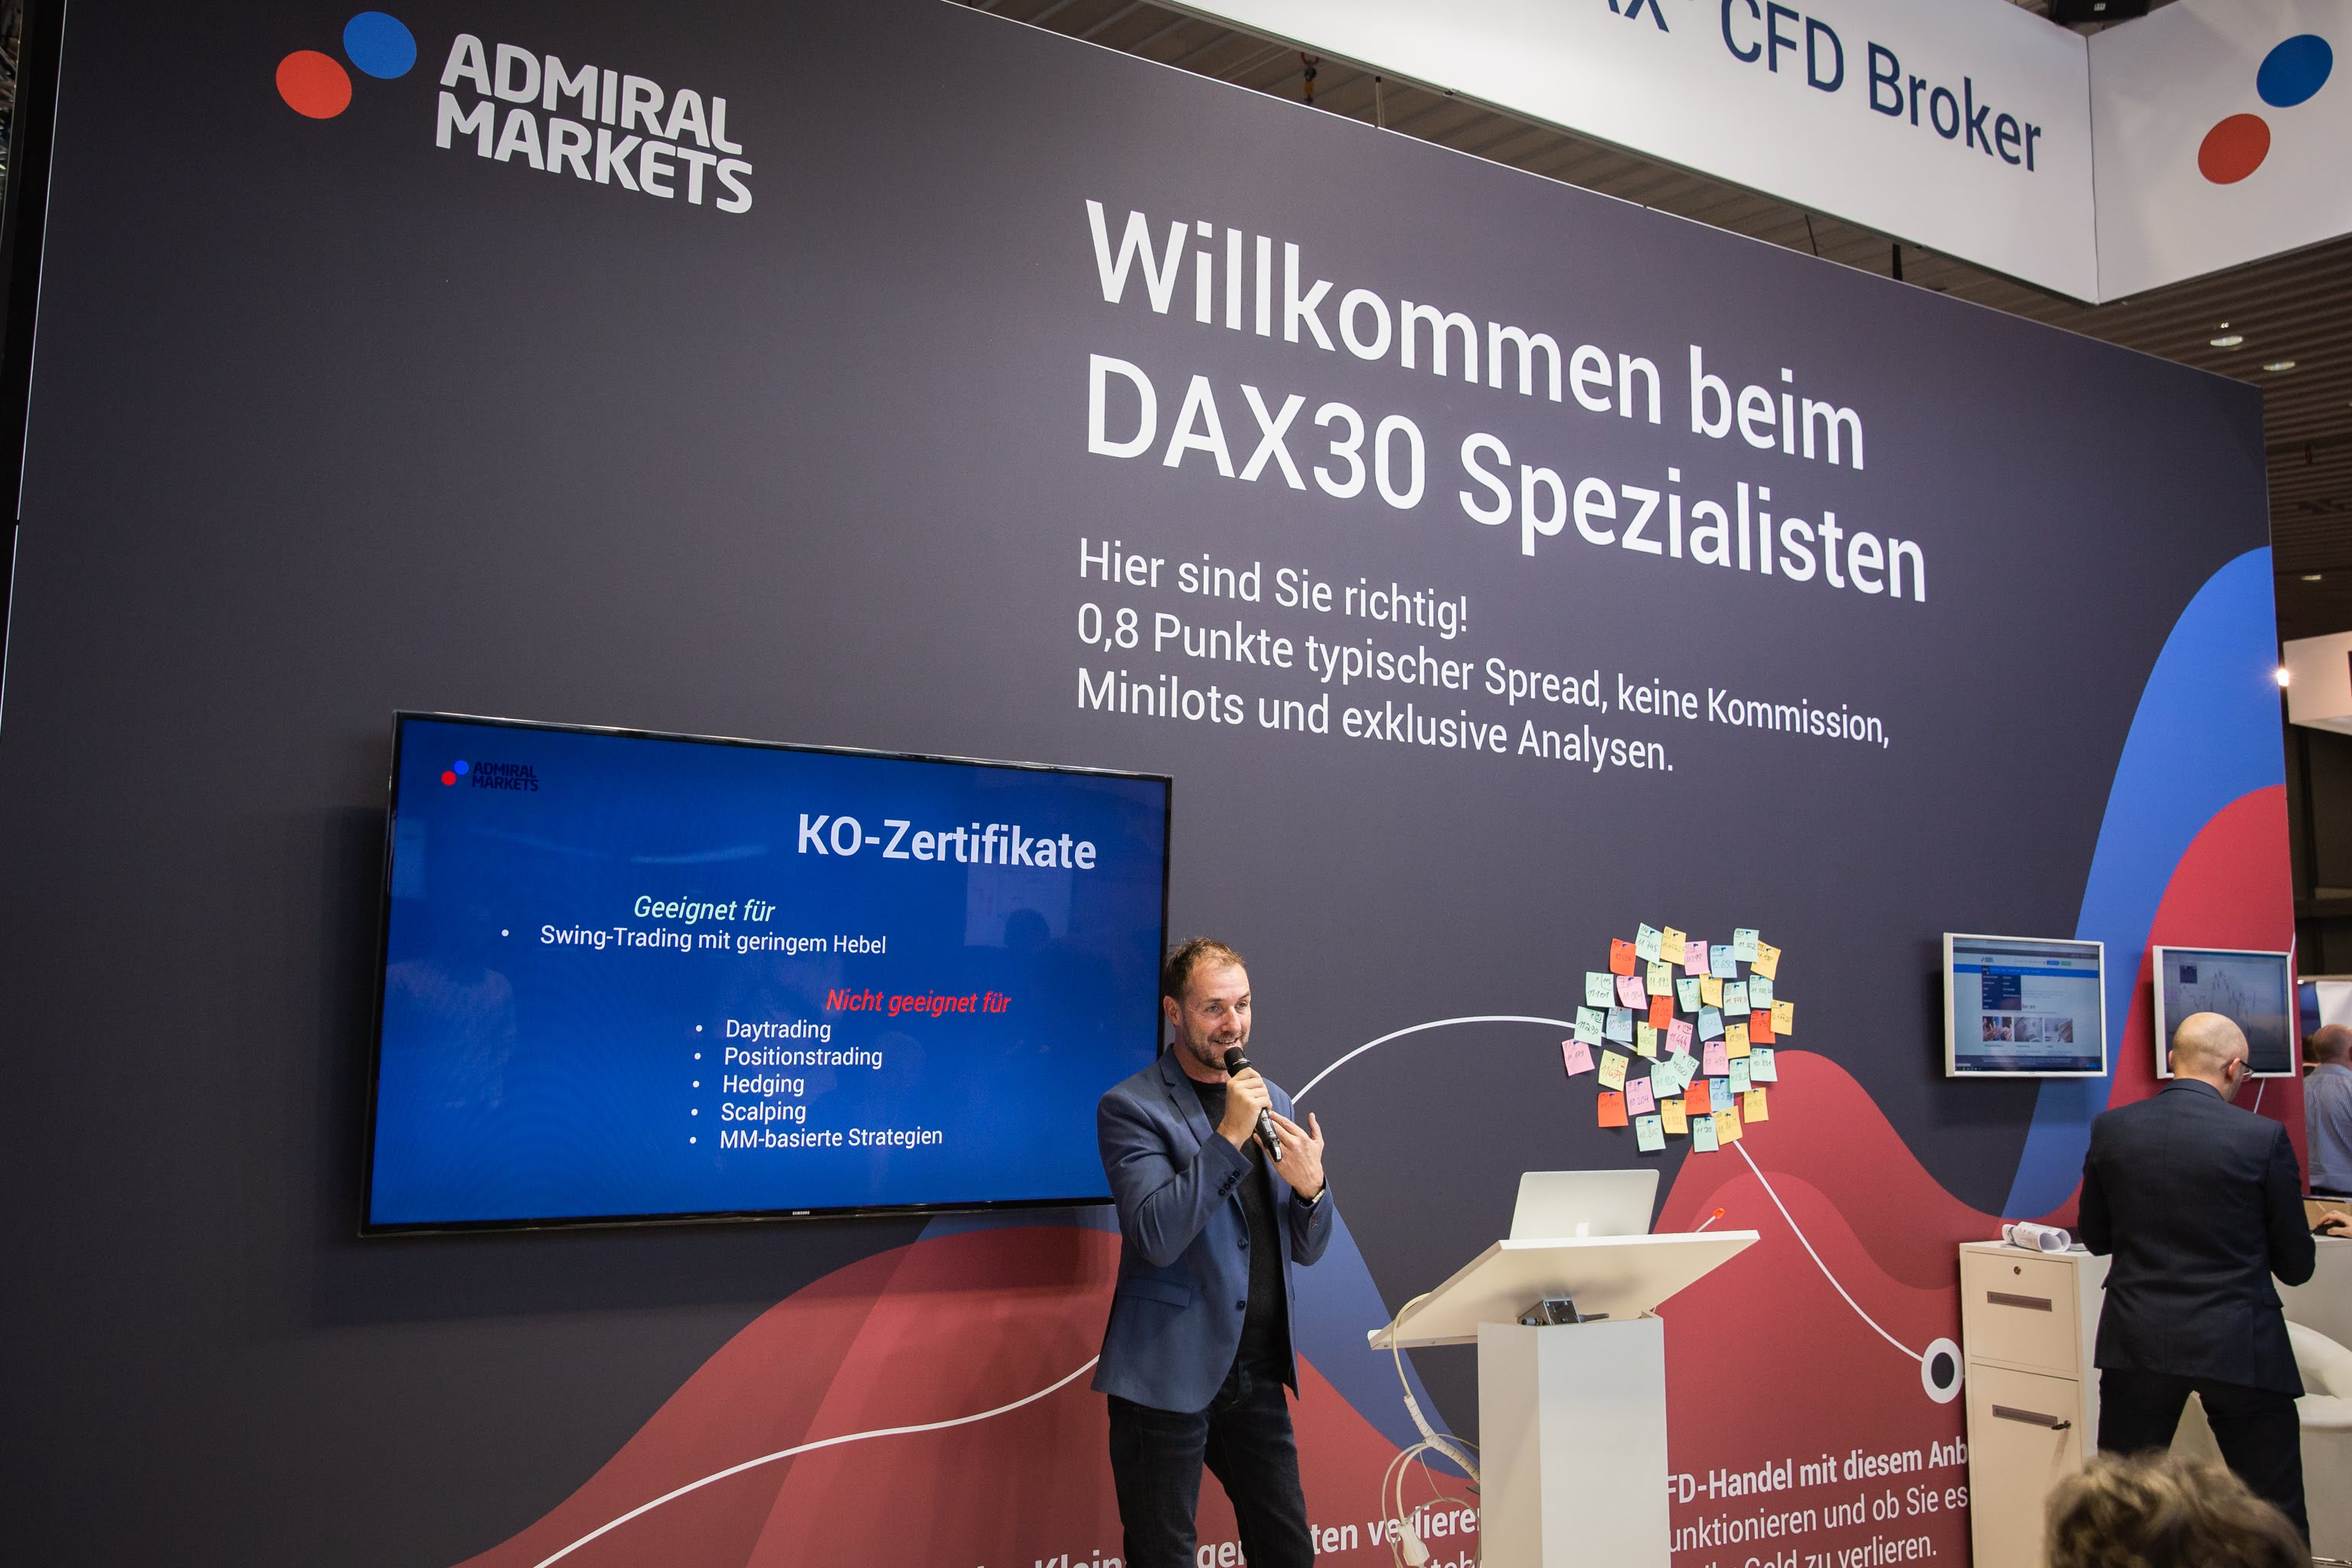 World of Trading - Dirk Hilger